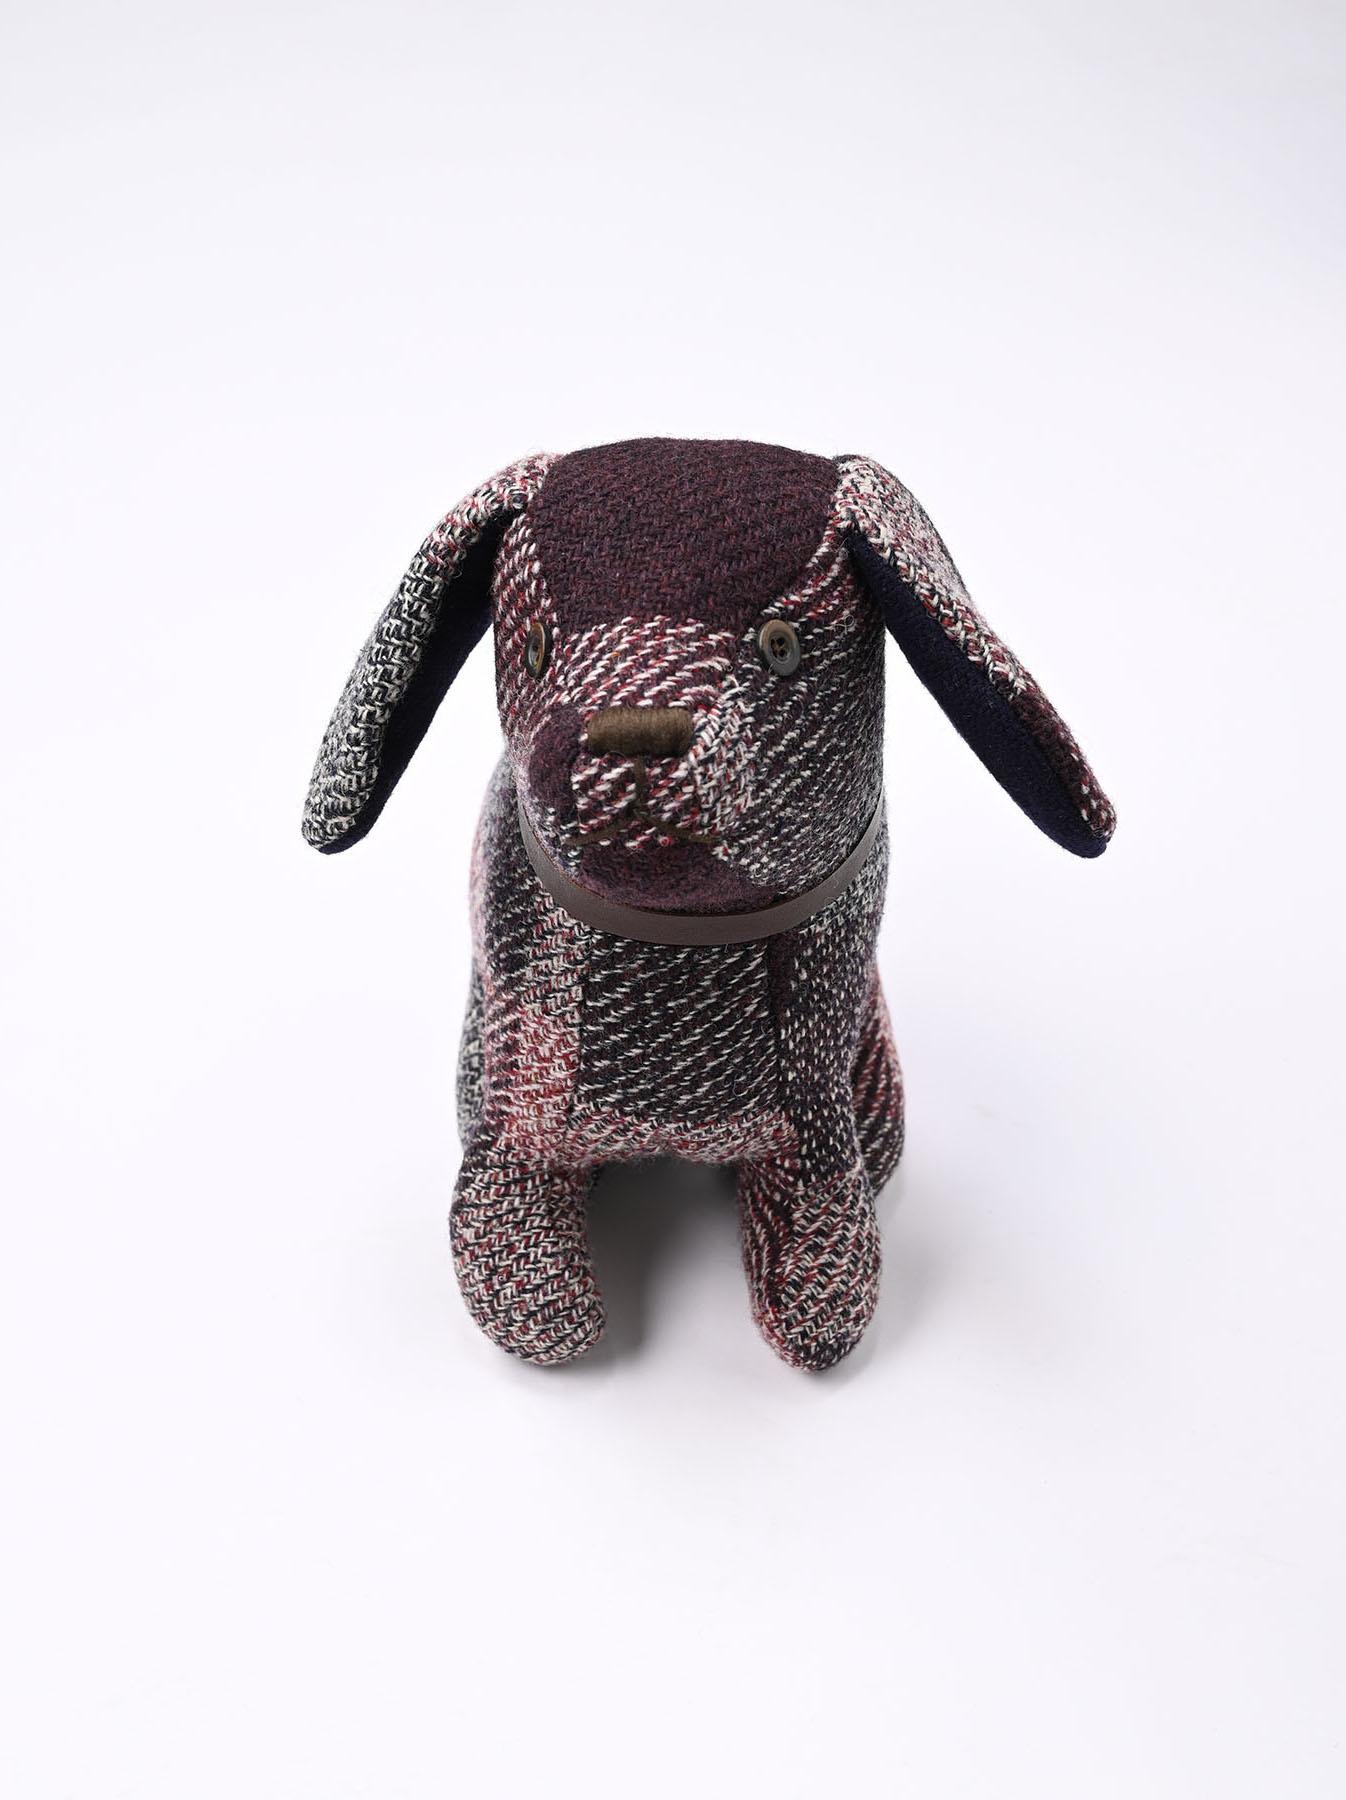 Stuffed Toy Dog-3